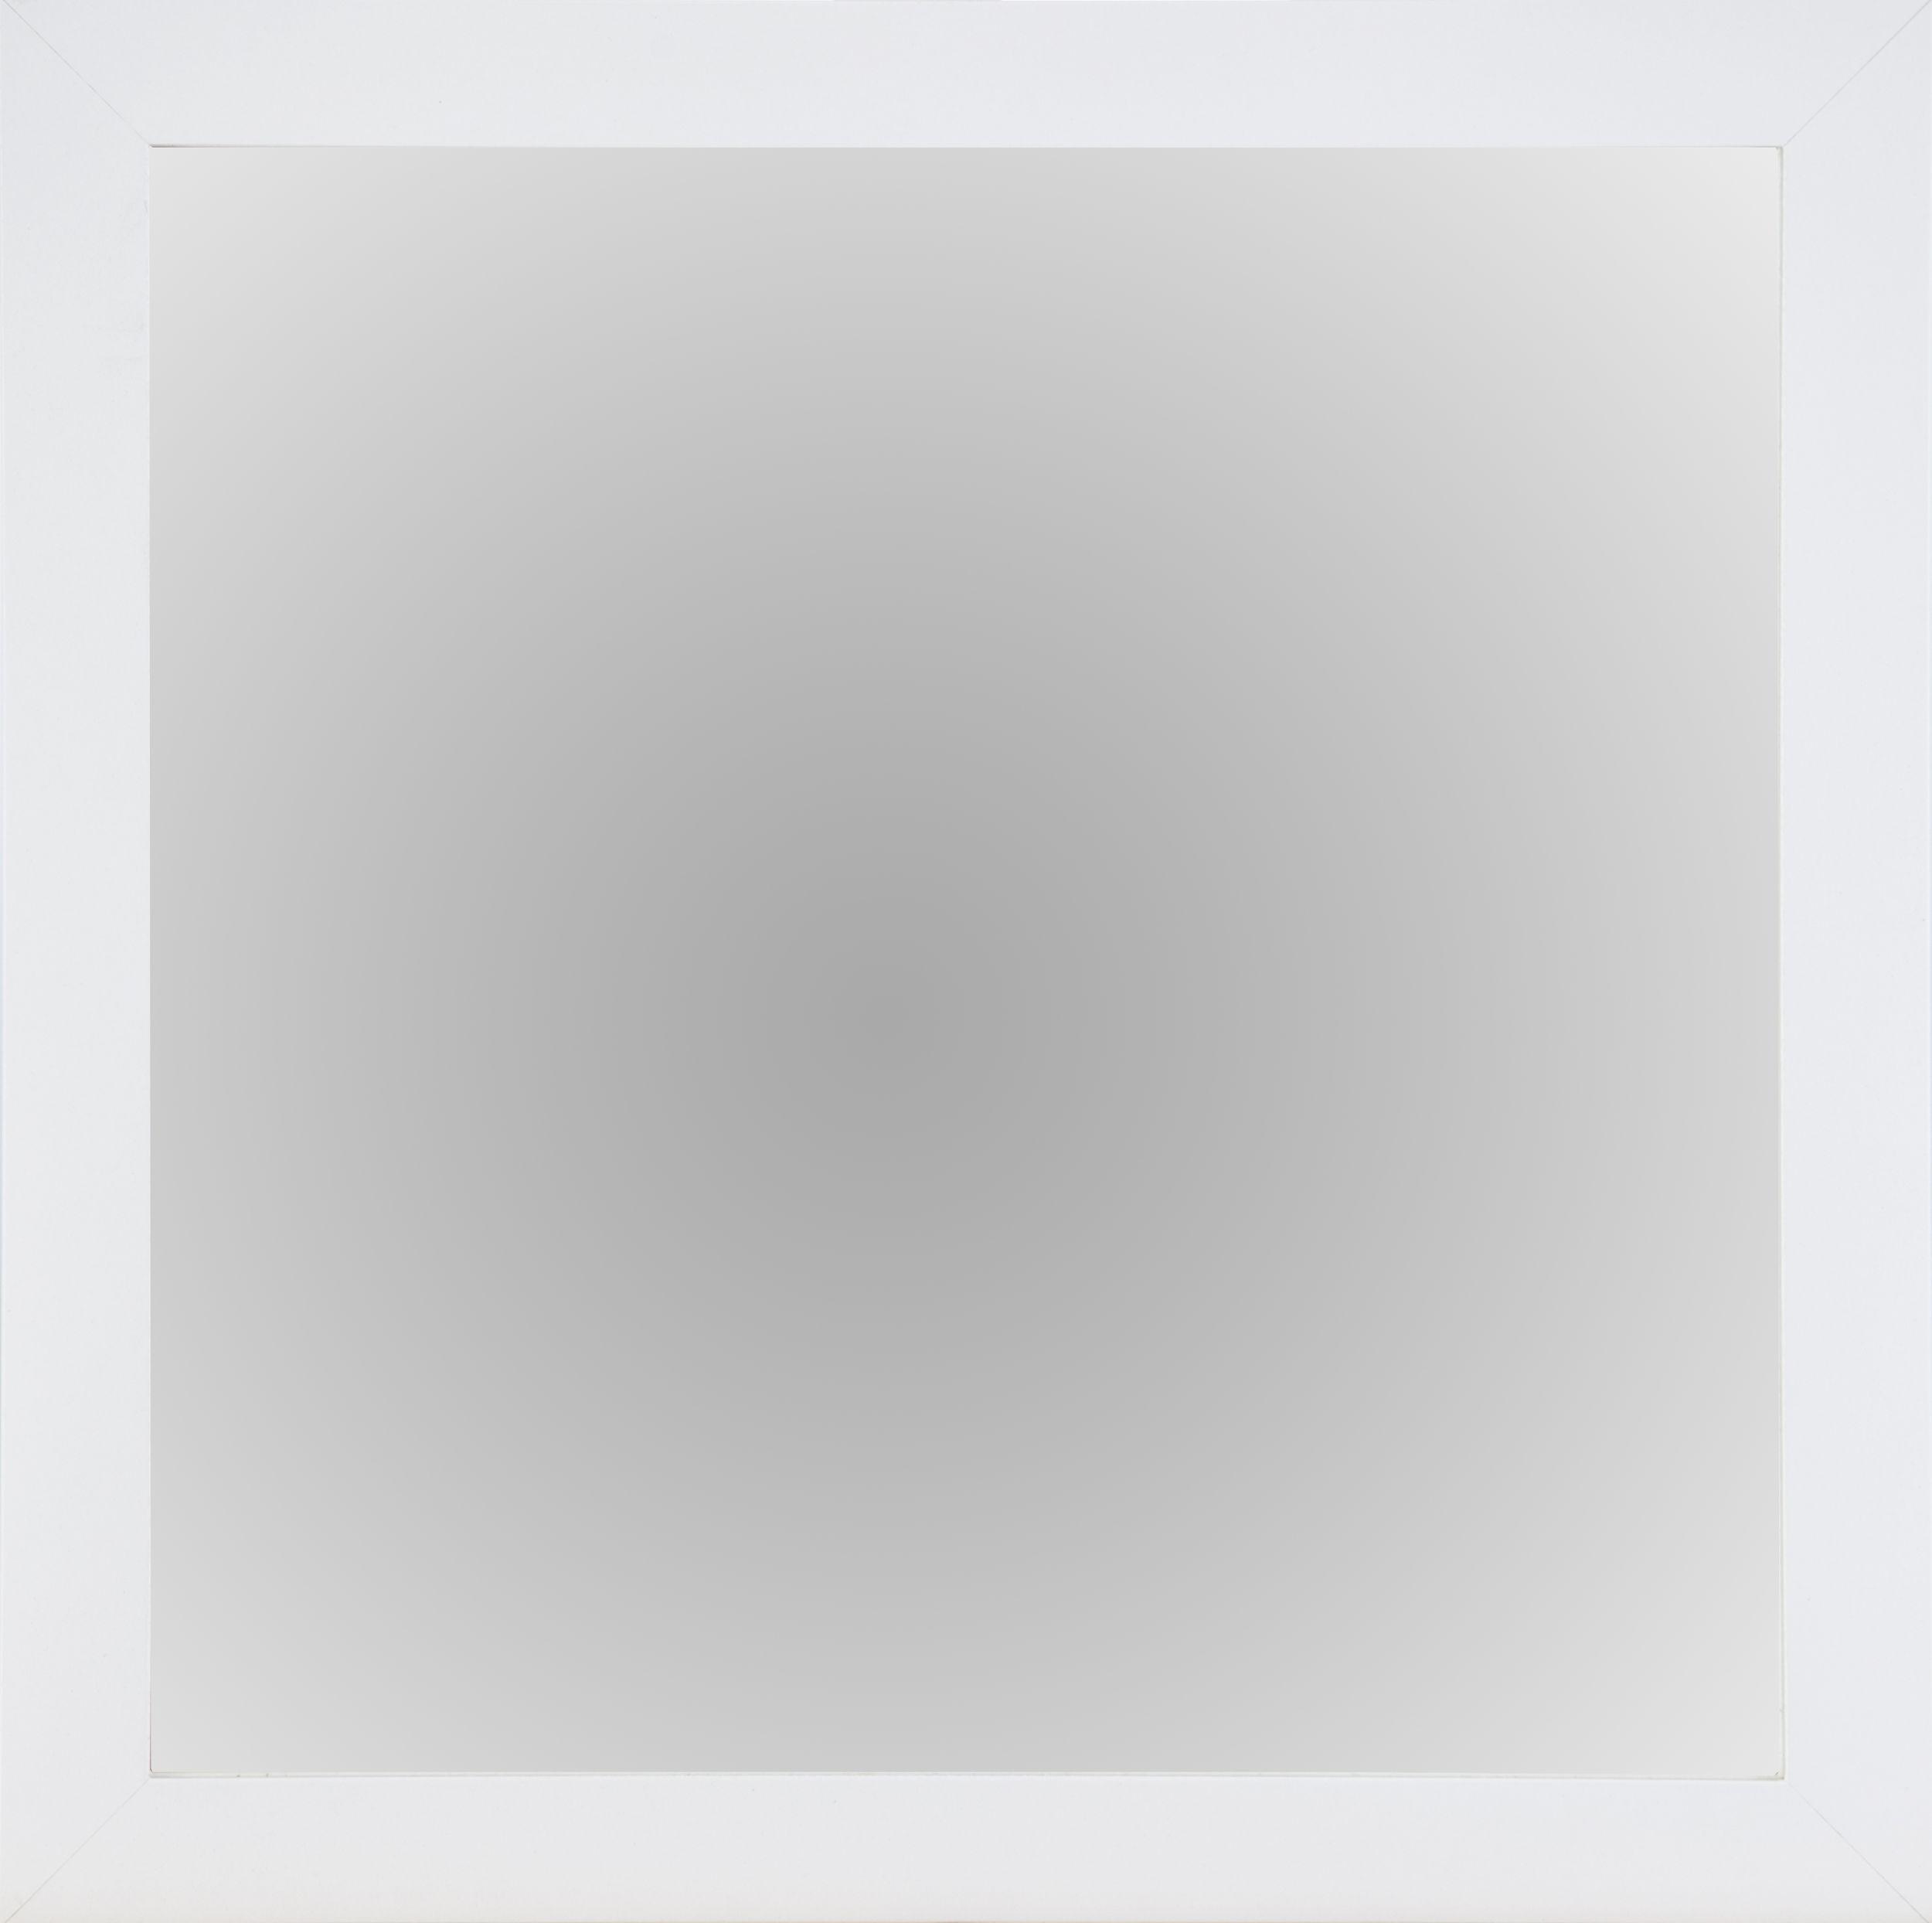 Rahmenspiegel 45x45cm KATHI